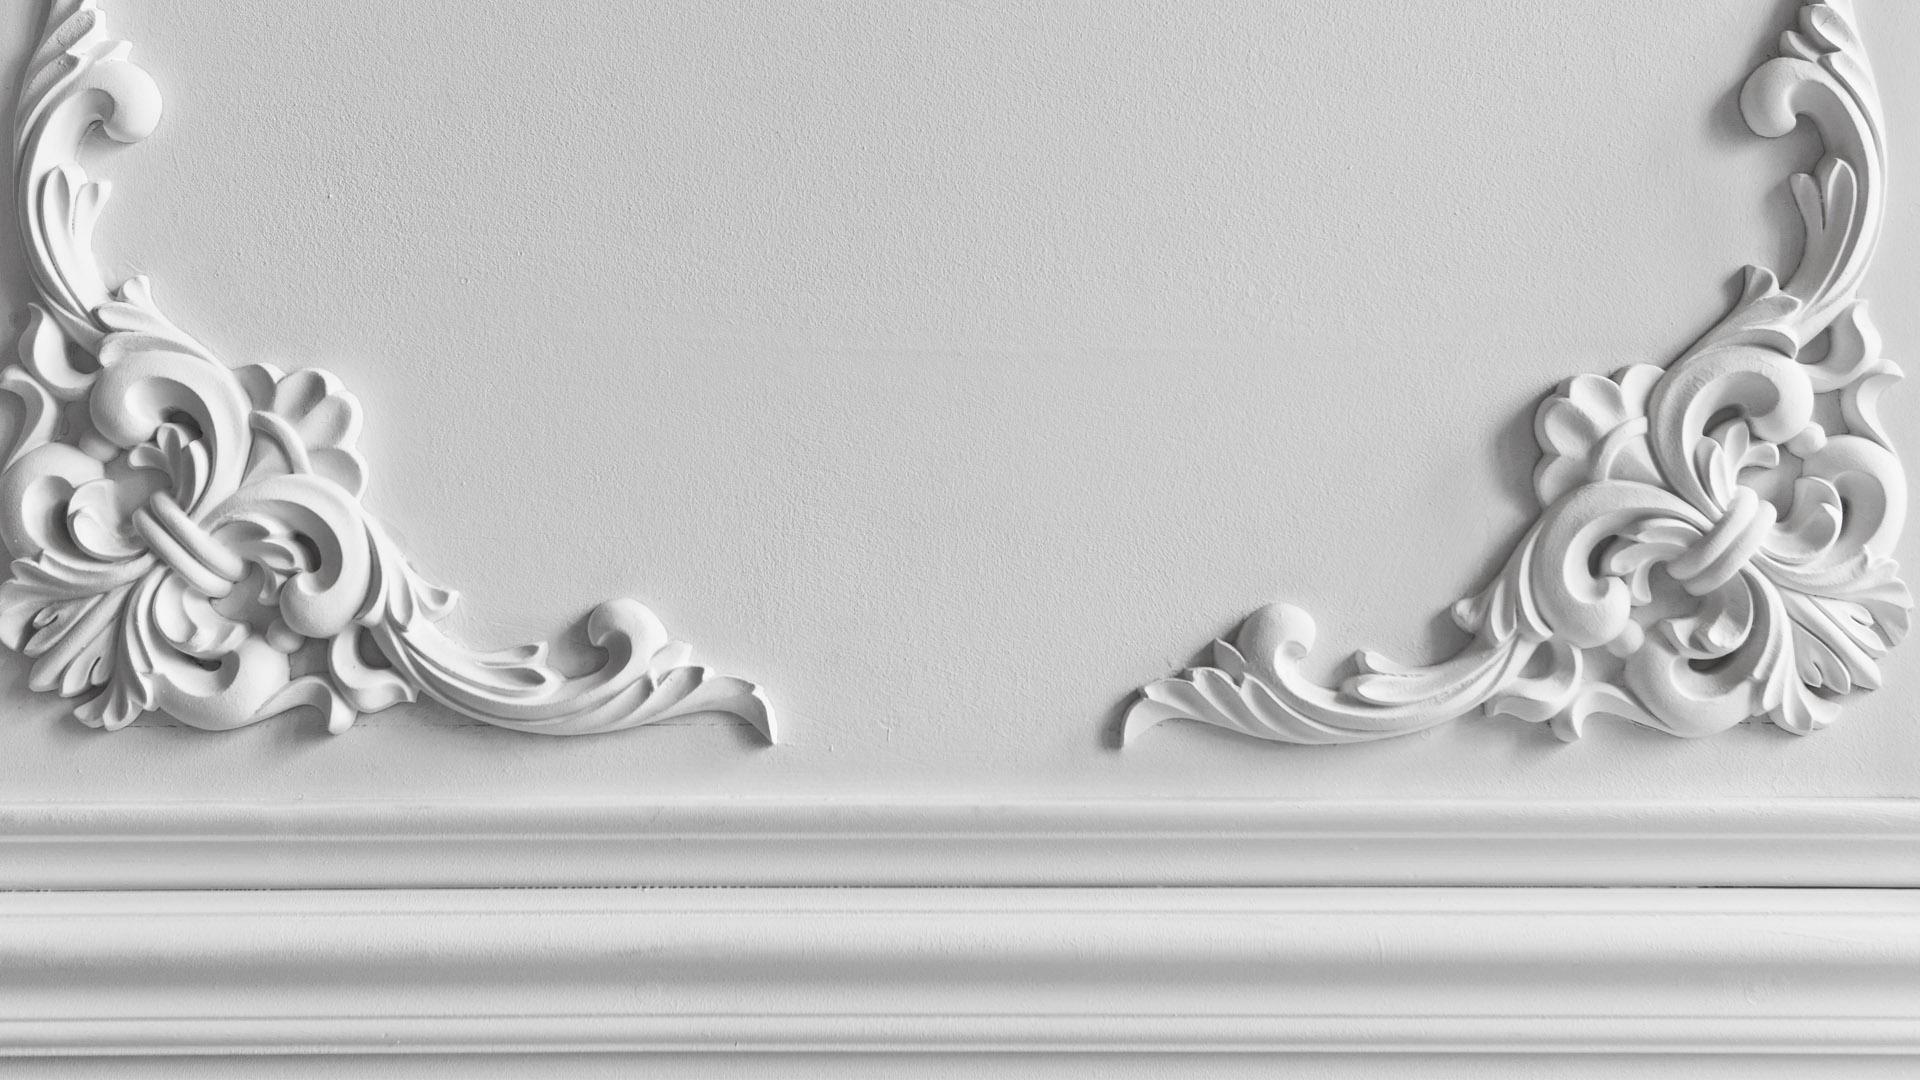 stuck benedikt schwartz s rl stuckateurmeisterbetrieb. Black Bedroom Furniture Sets. Home Design Ideas